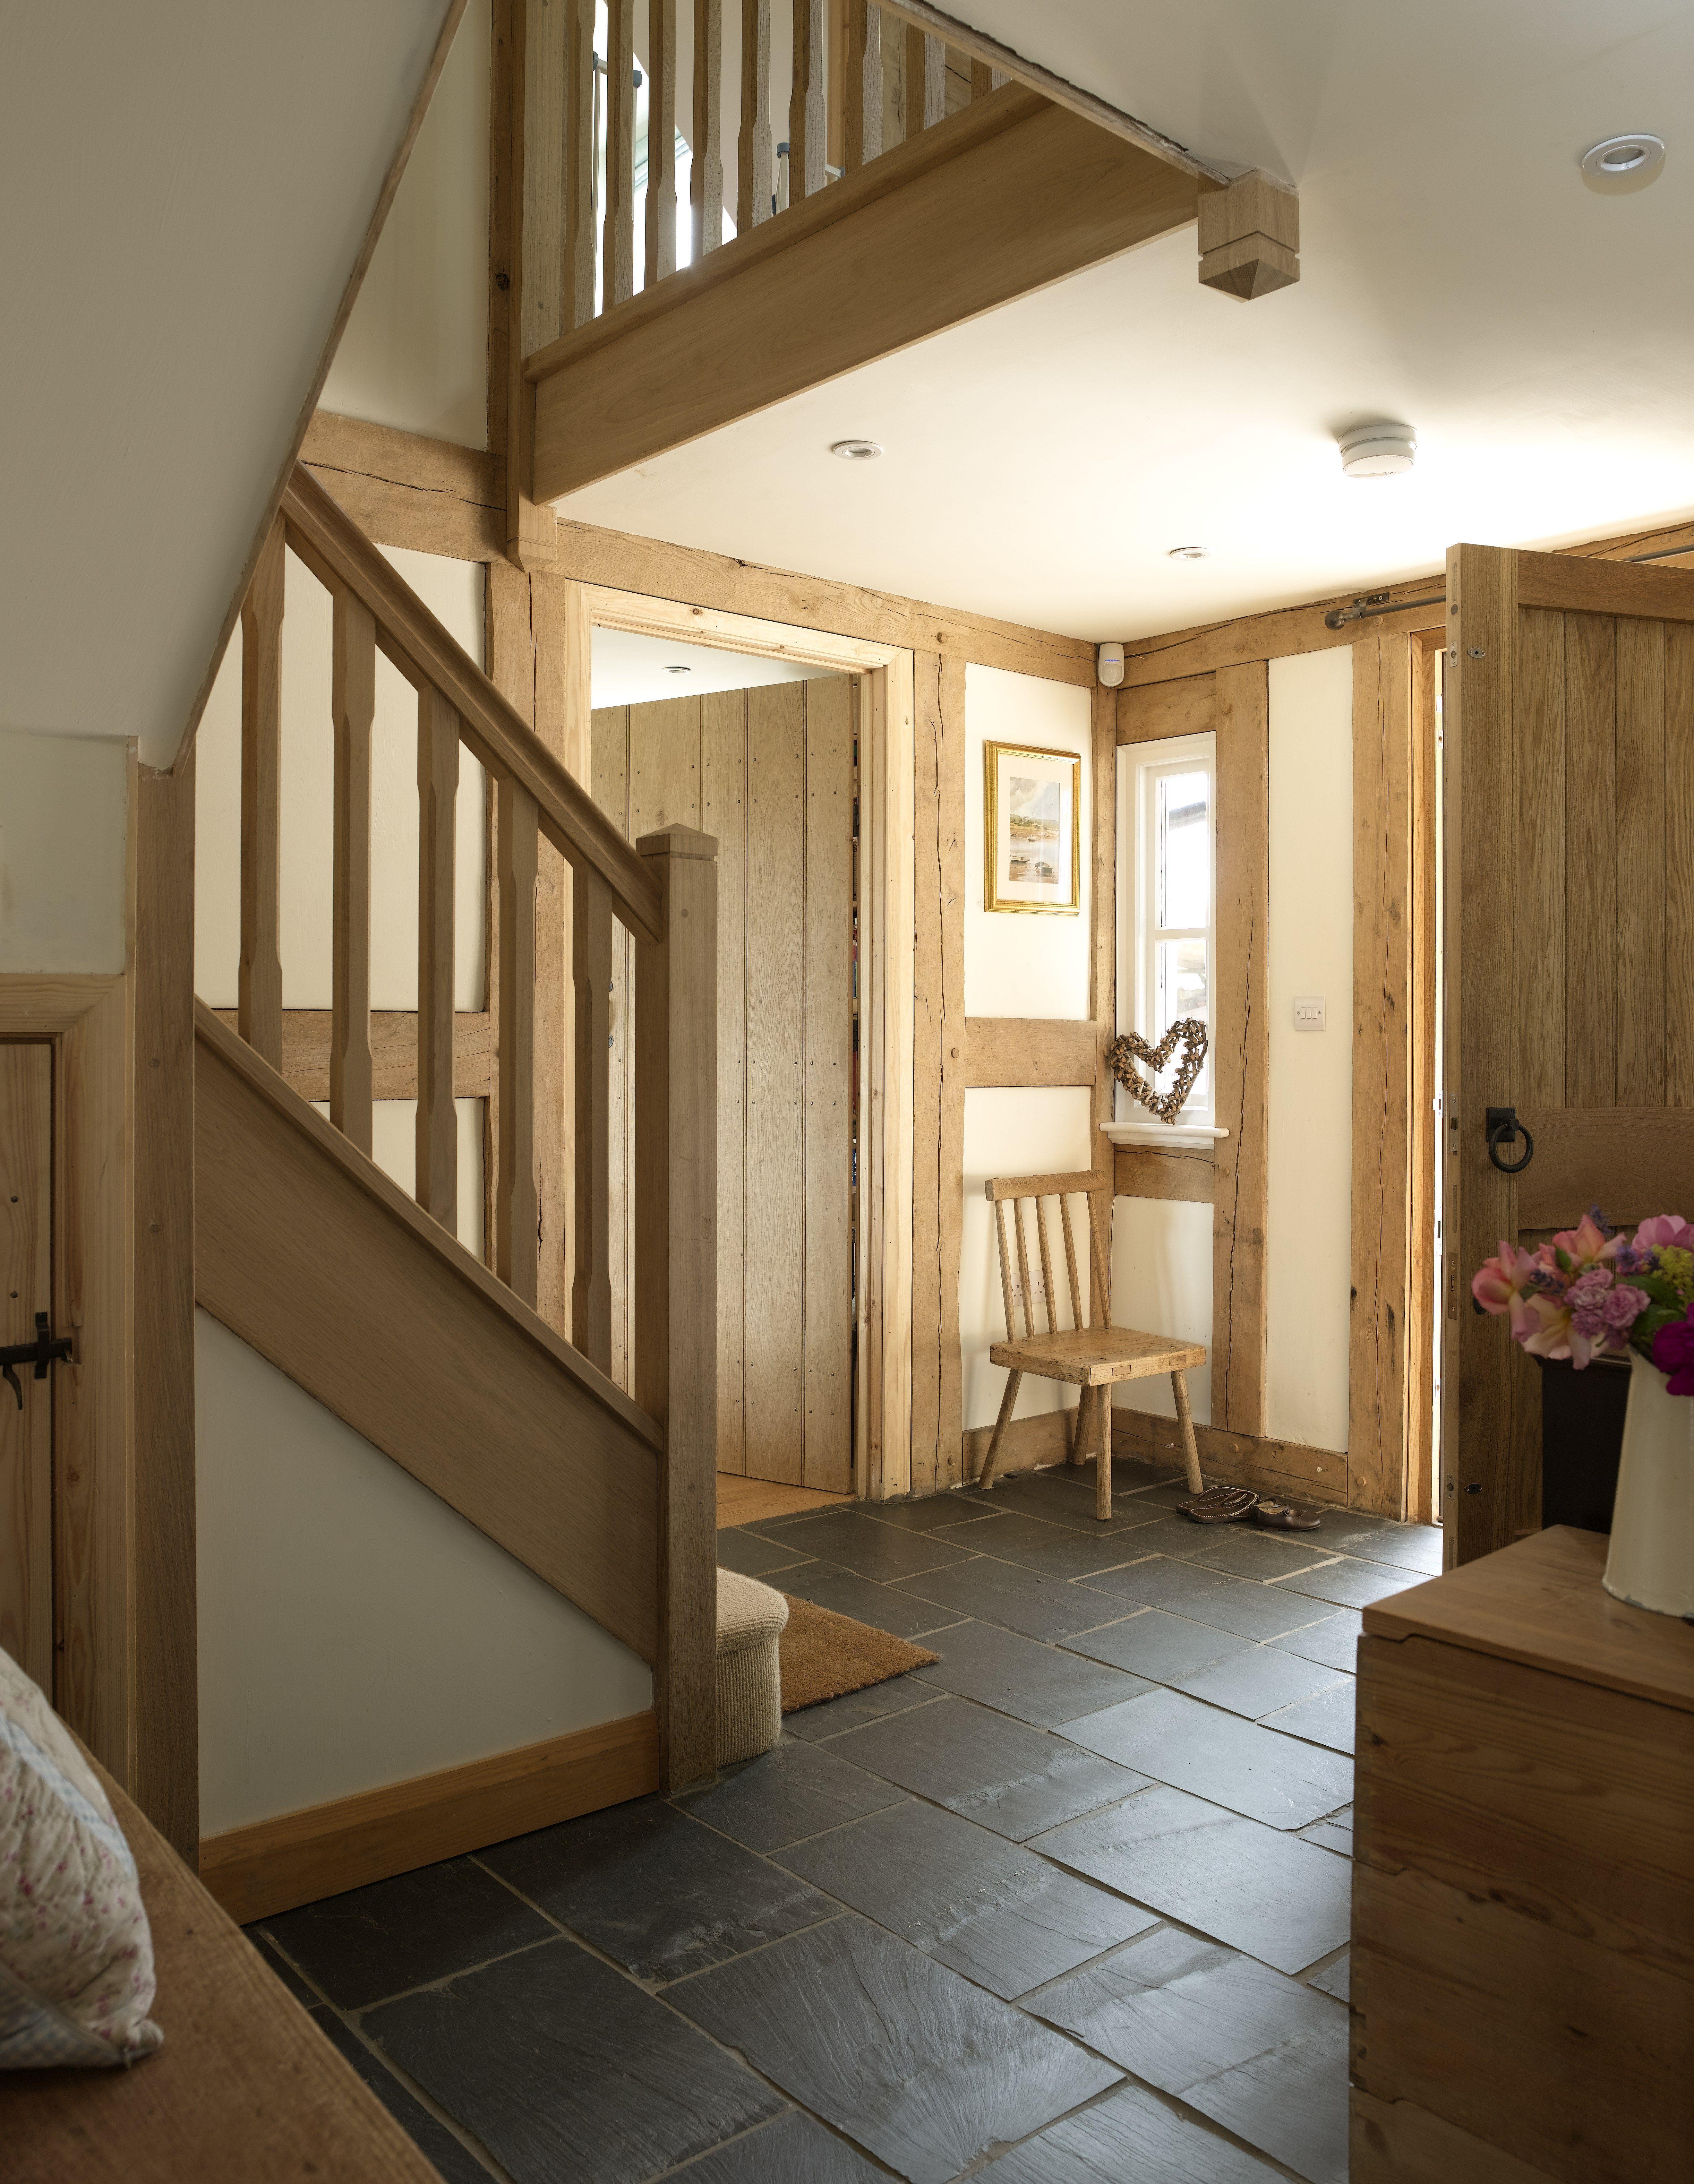 Best From Little Acorns Oak Frame House House Home 400 x 300